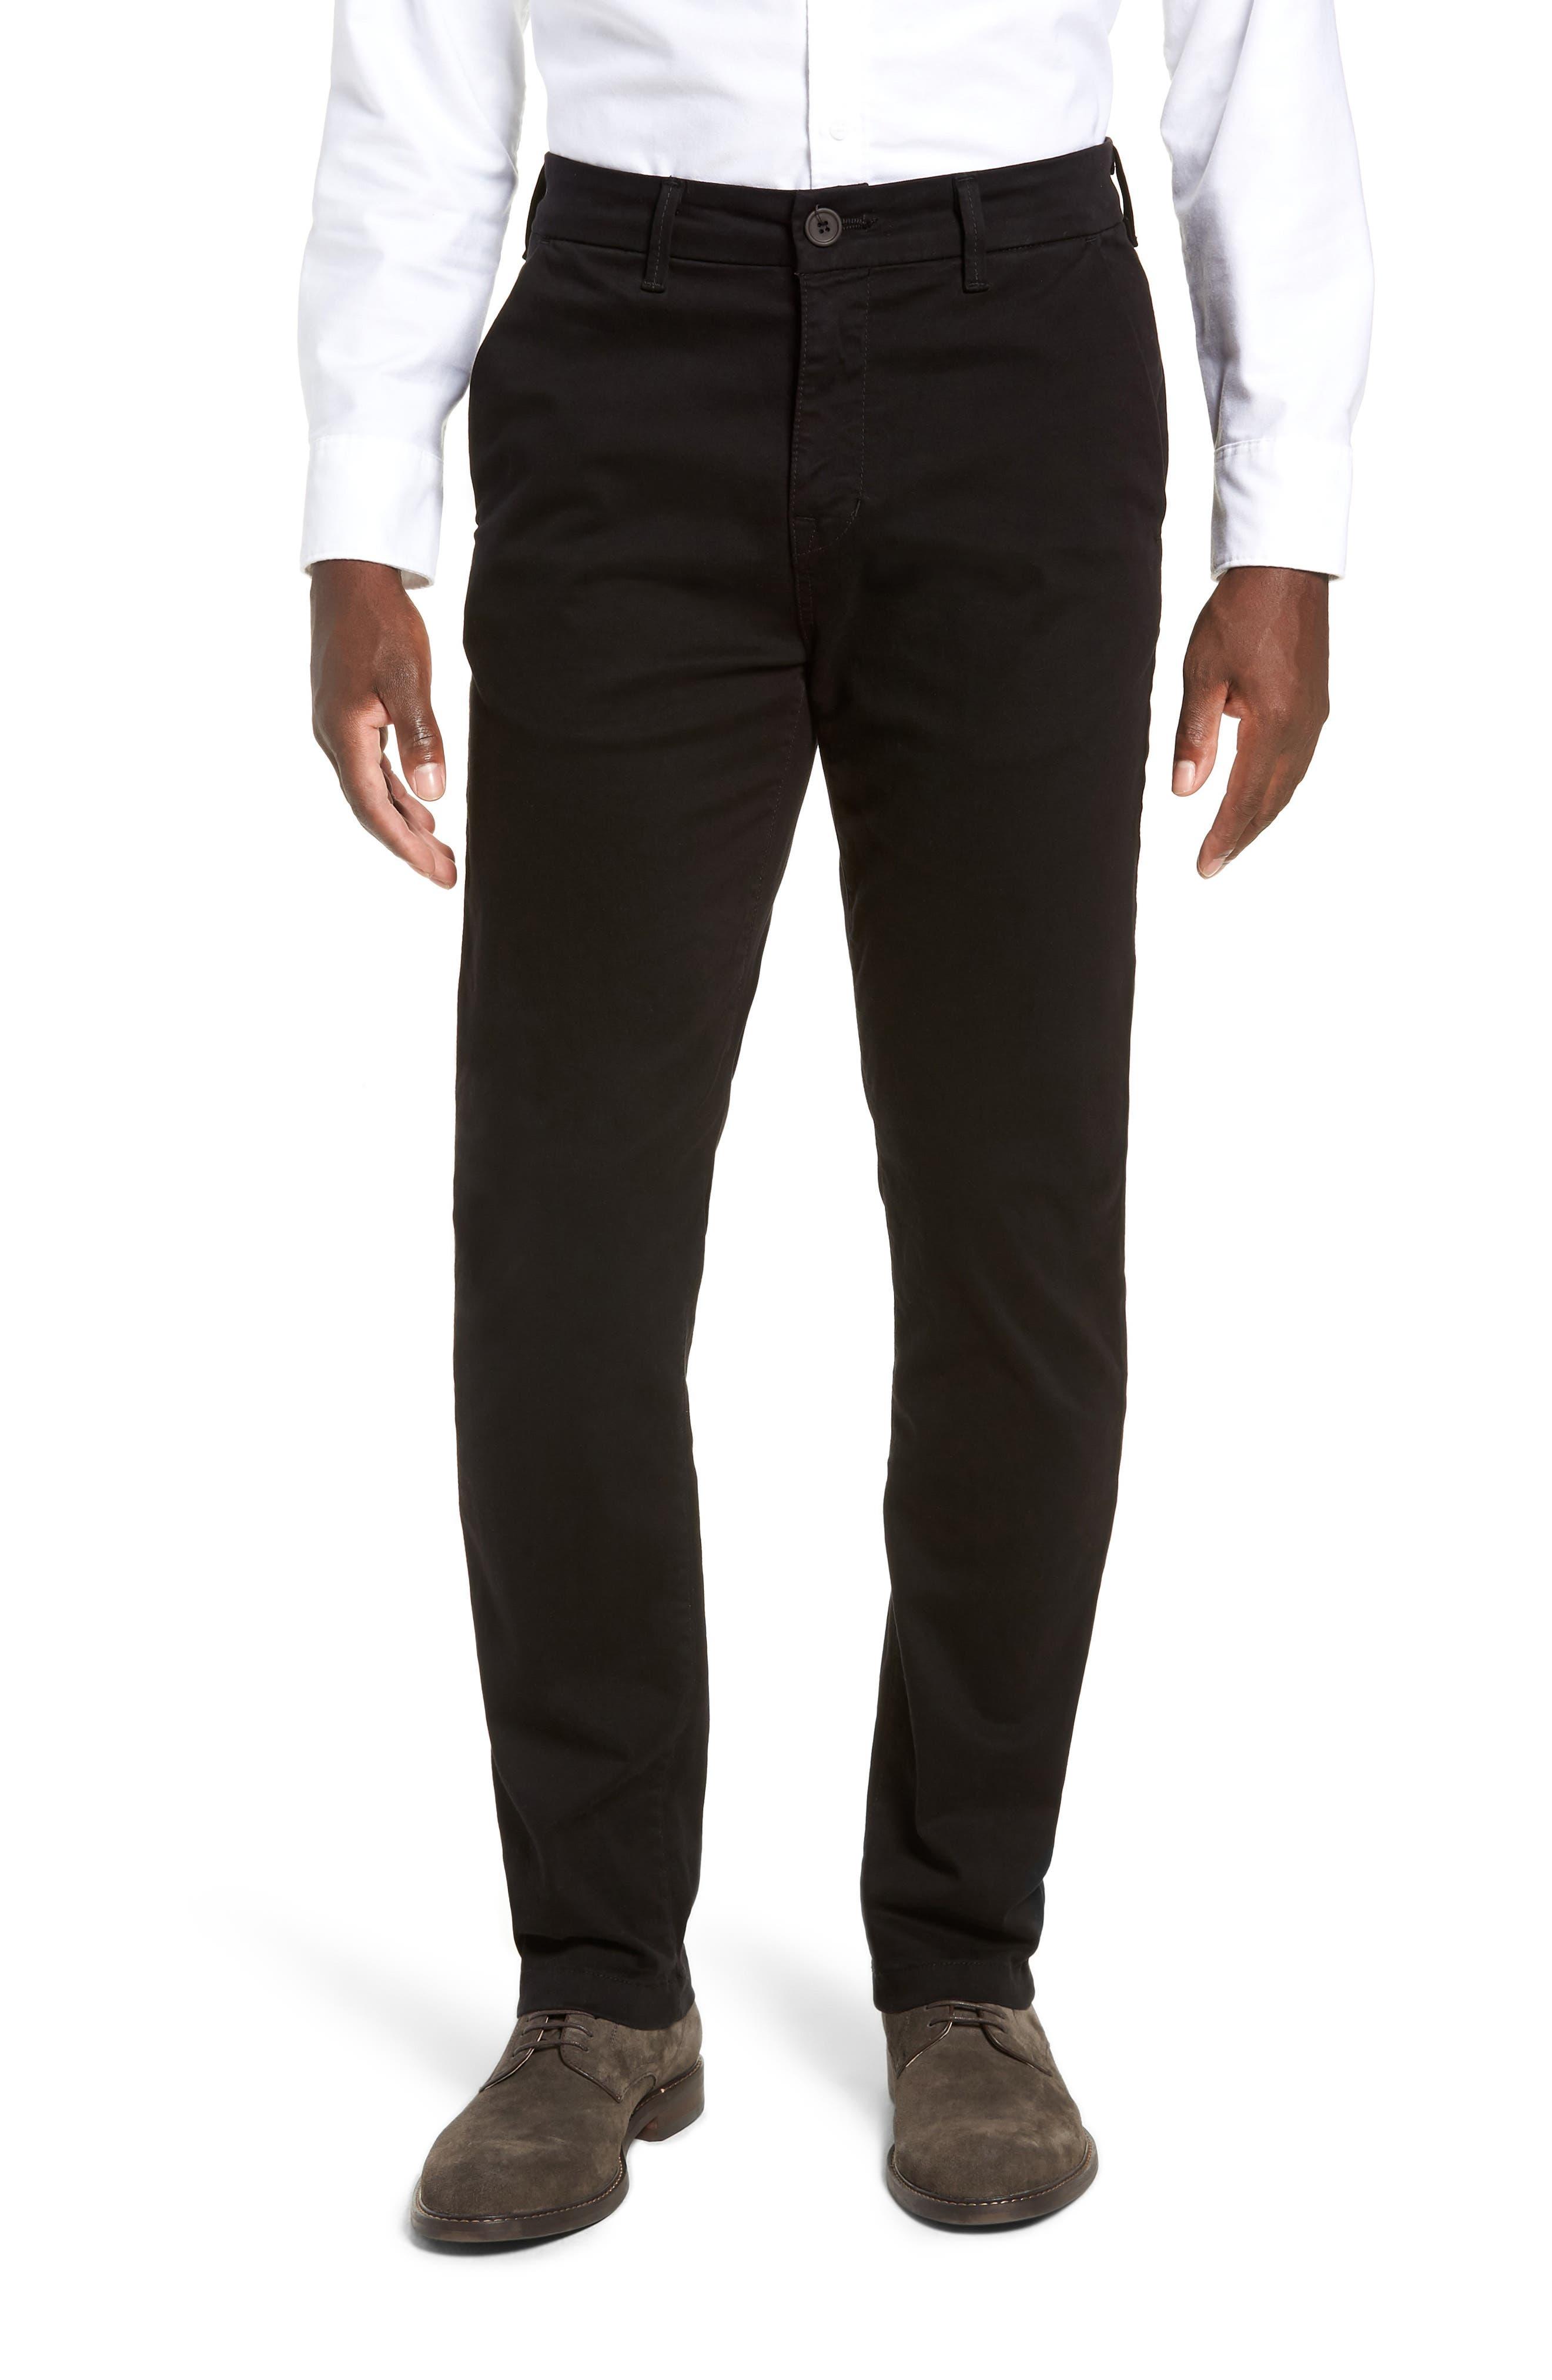 FIDELITY DENIM Weekend Slim Fit Chino Pants, Main, color, 001